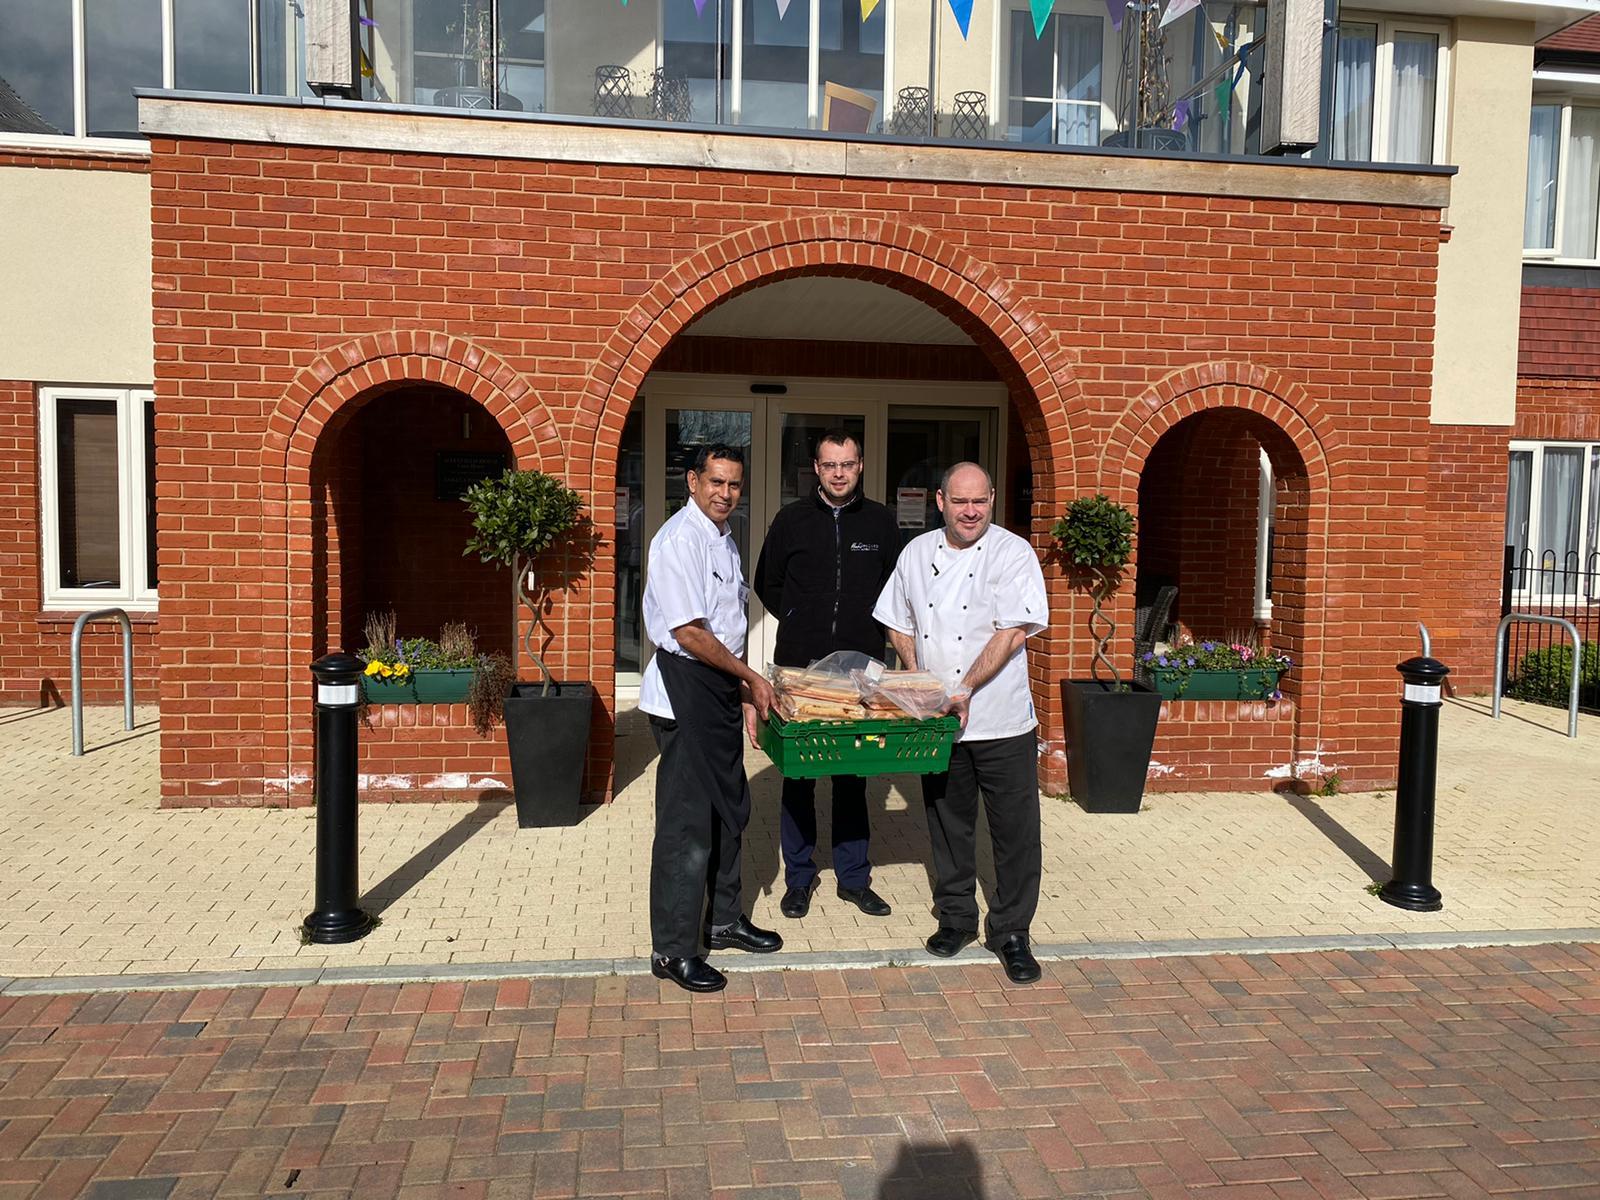 Woodland Park Hotel Delivering scones to hospice